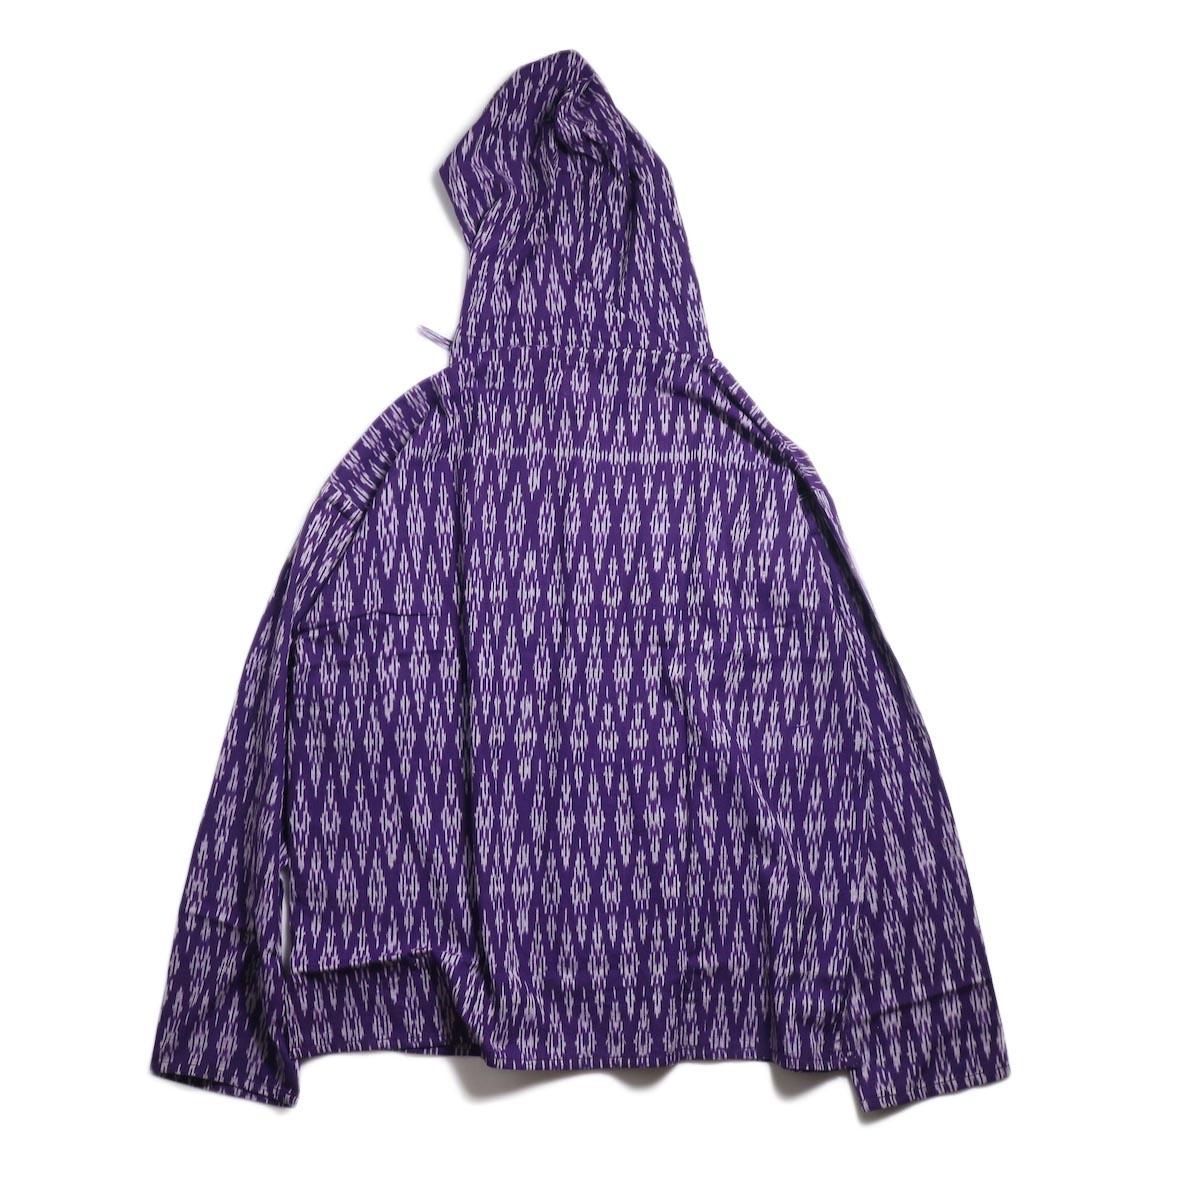 SOUTH2 WEST8 / Mexican Parka -Cotton Cloth / Splashed Pattern (Purple) 背面